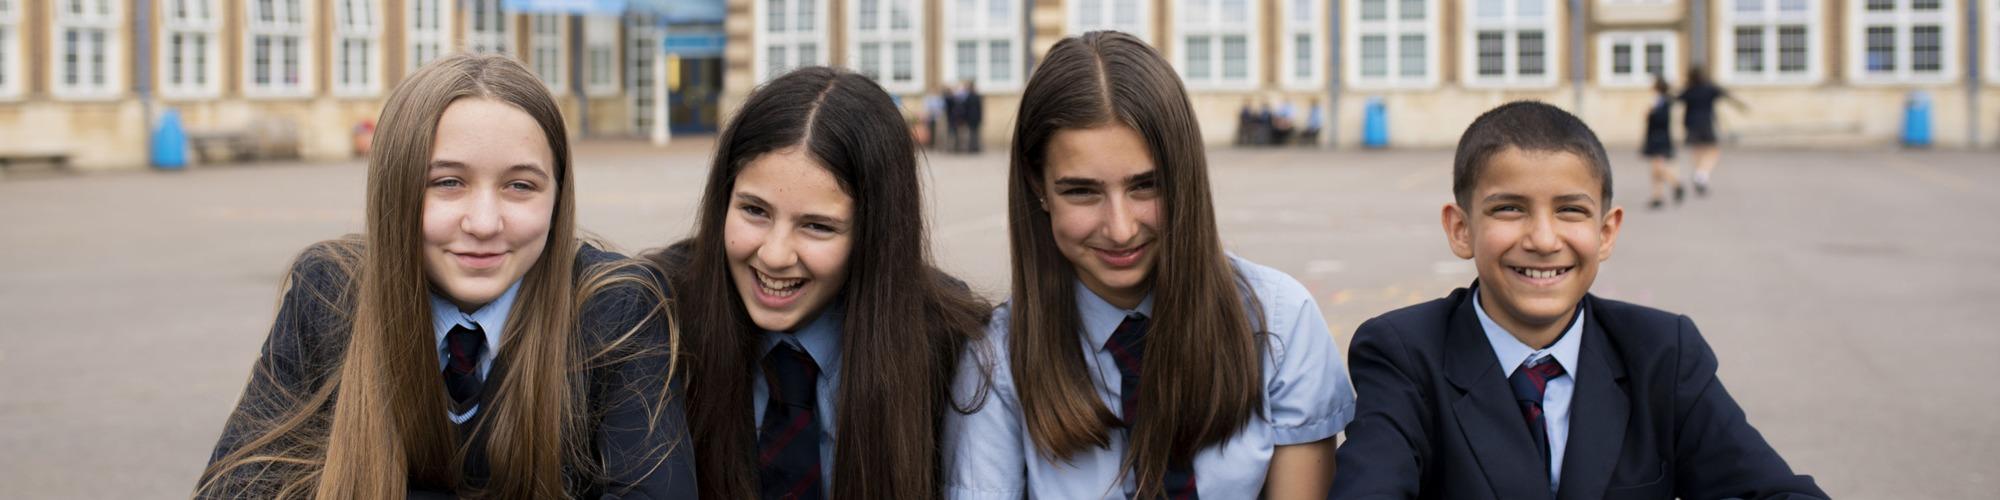 19 07 16.Chiswick School.1728